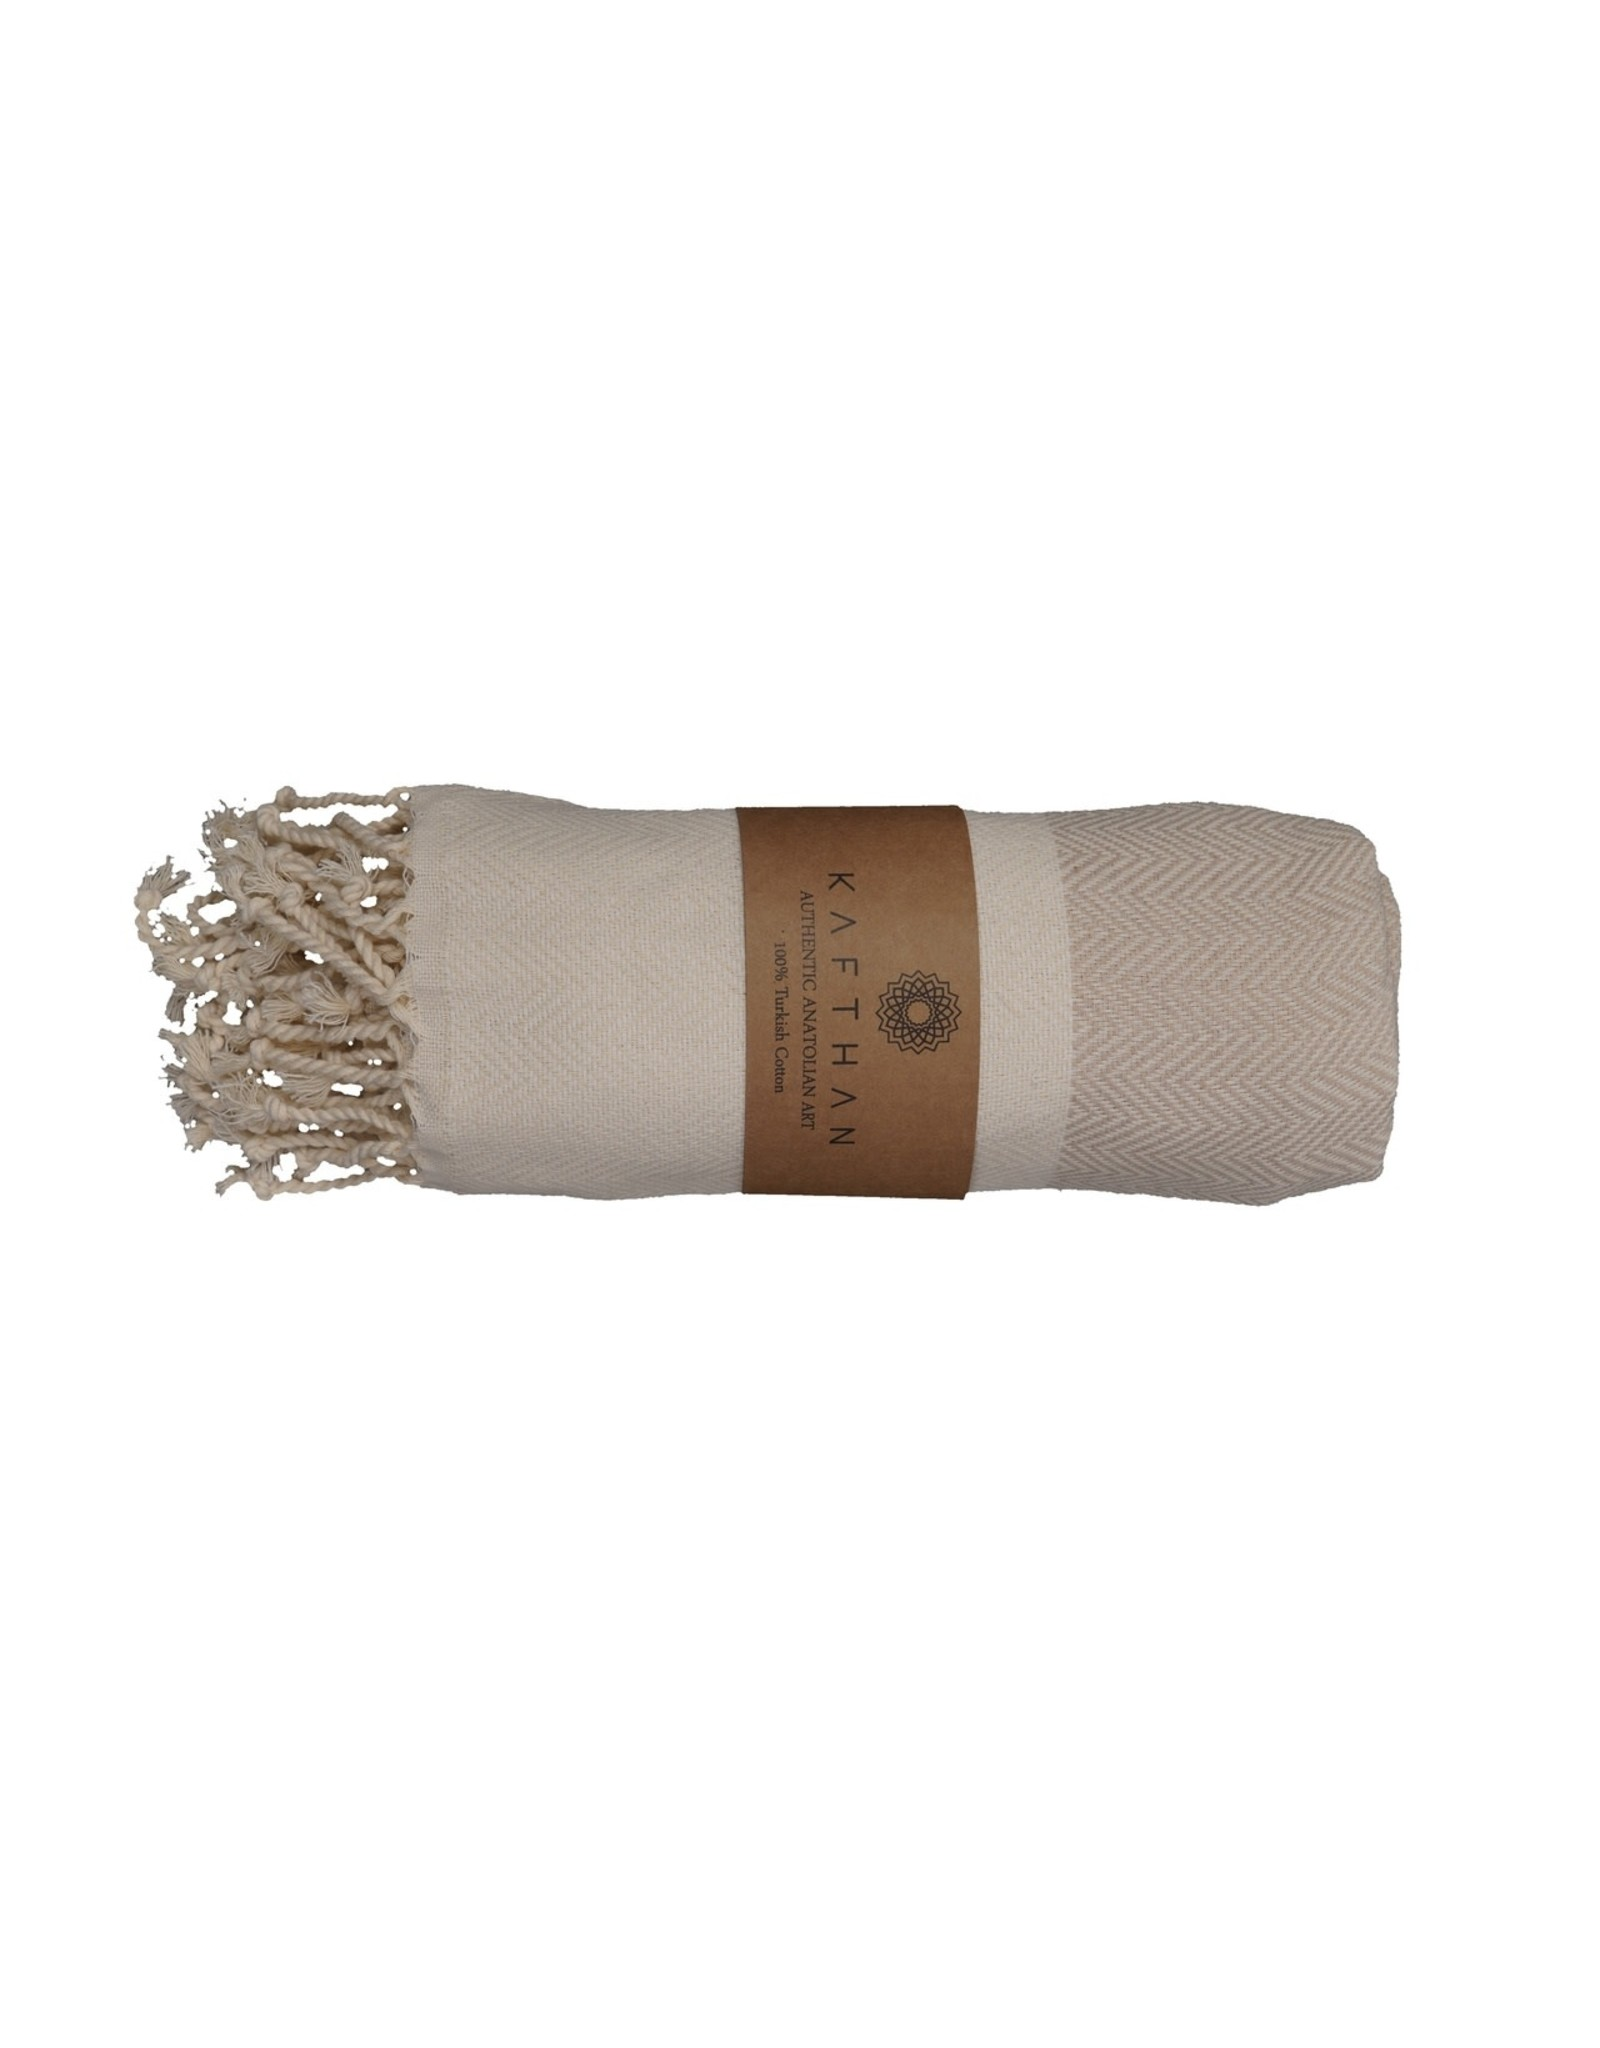 Turkish Towel, Fish Bone Beige, Turkey